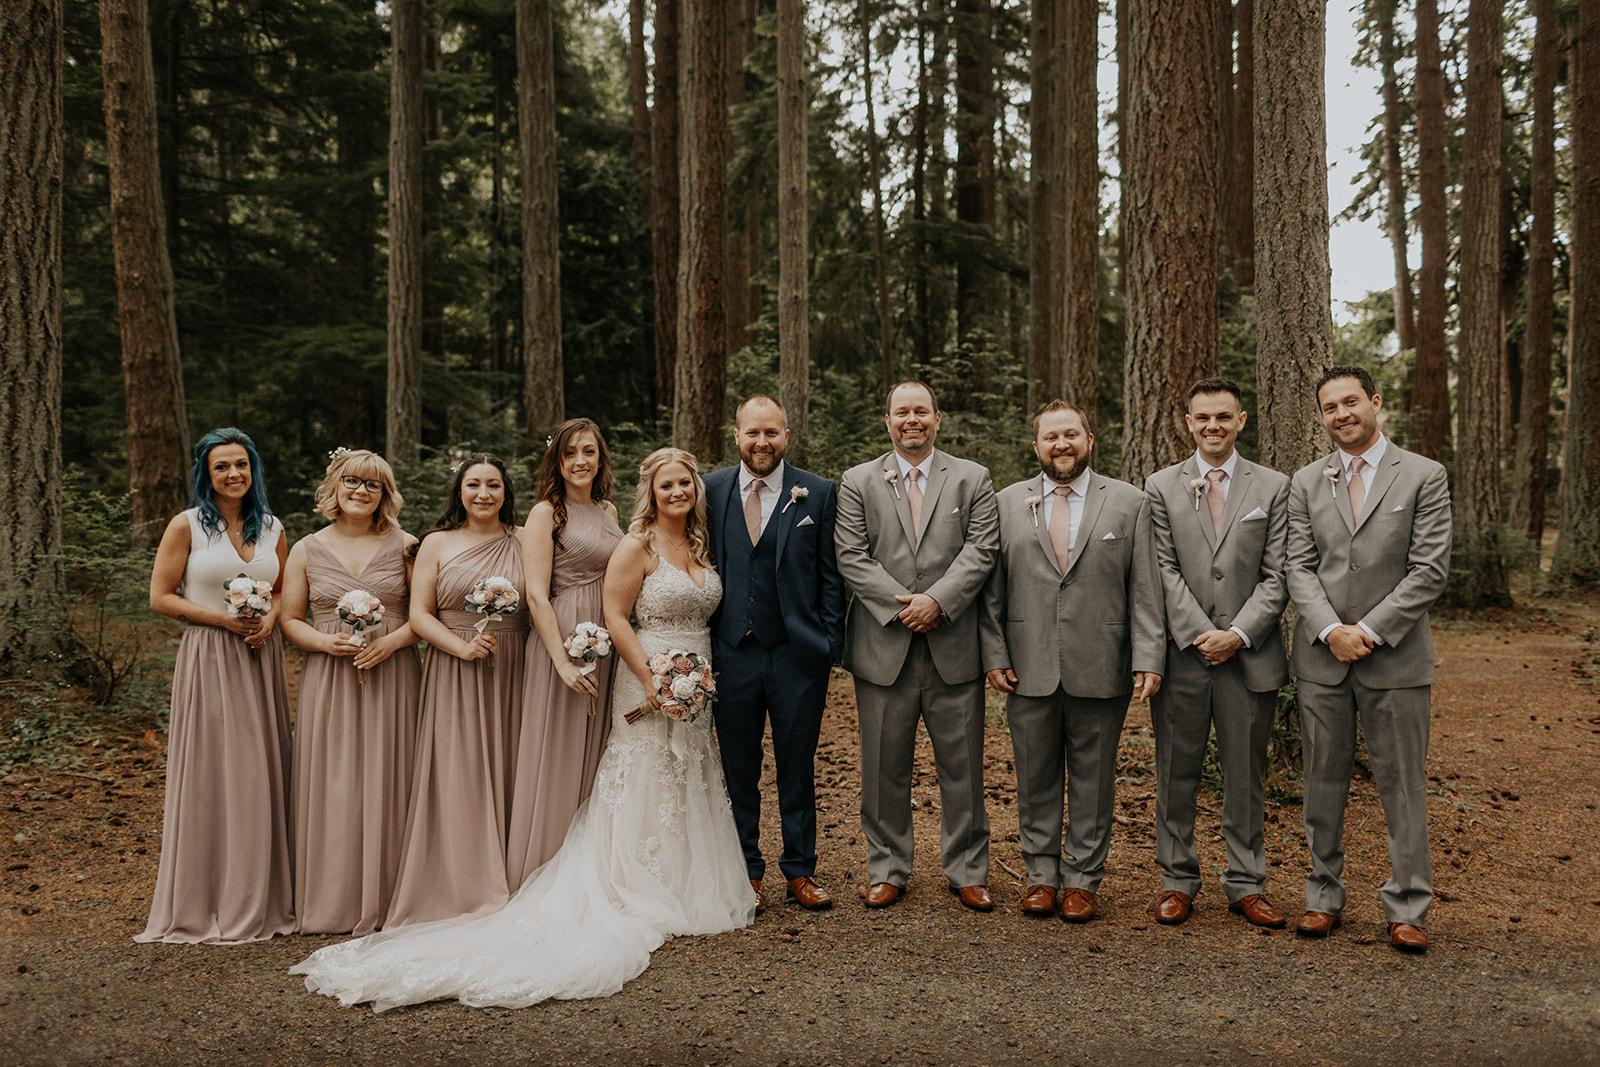 ginapaulson_shannonandbrandonwedding-454.jpg